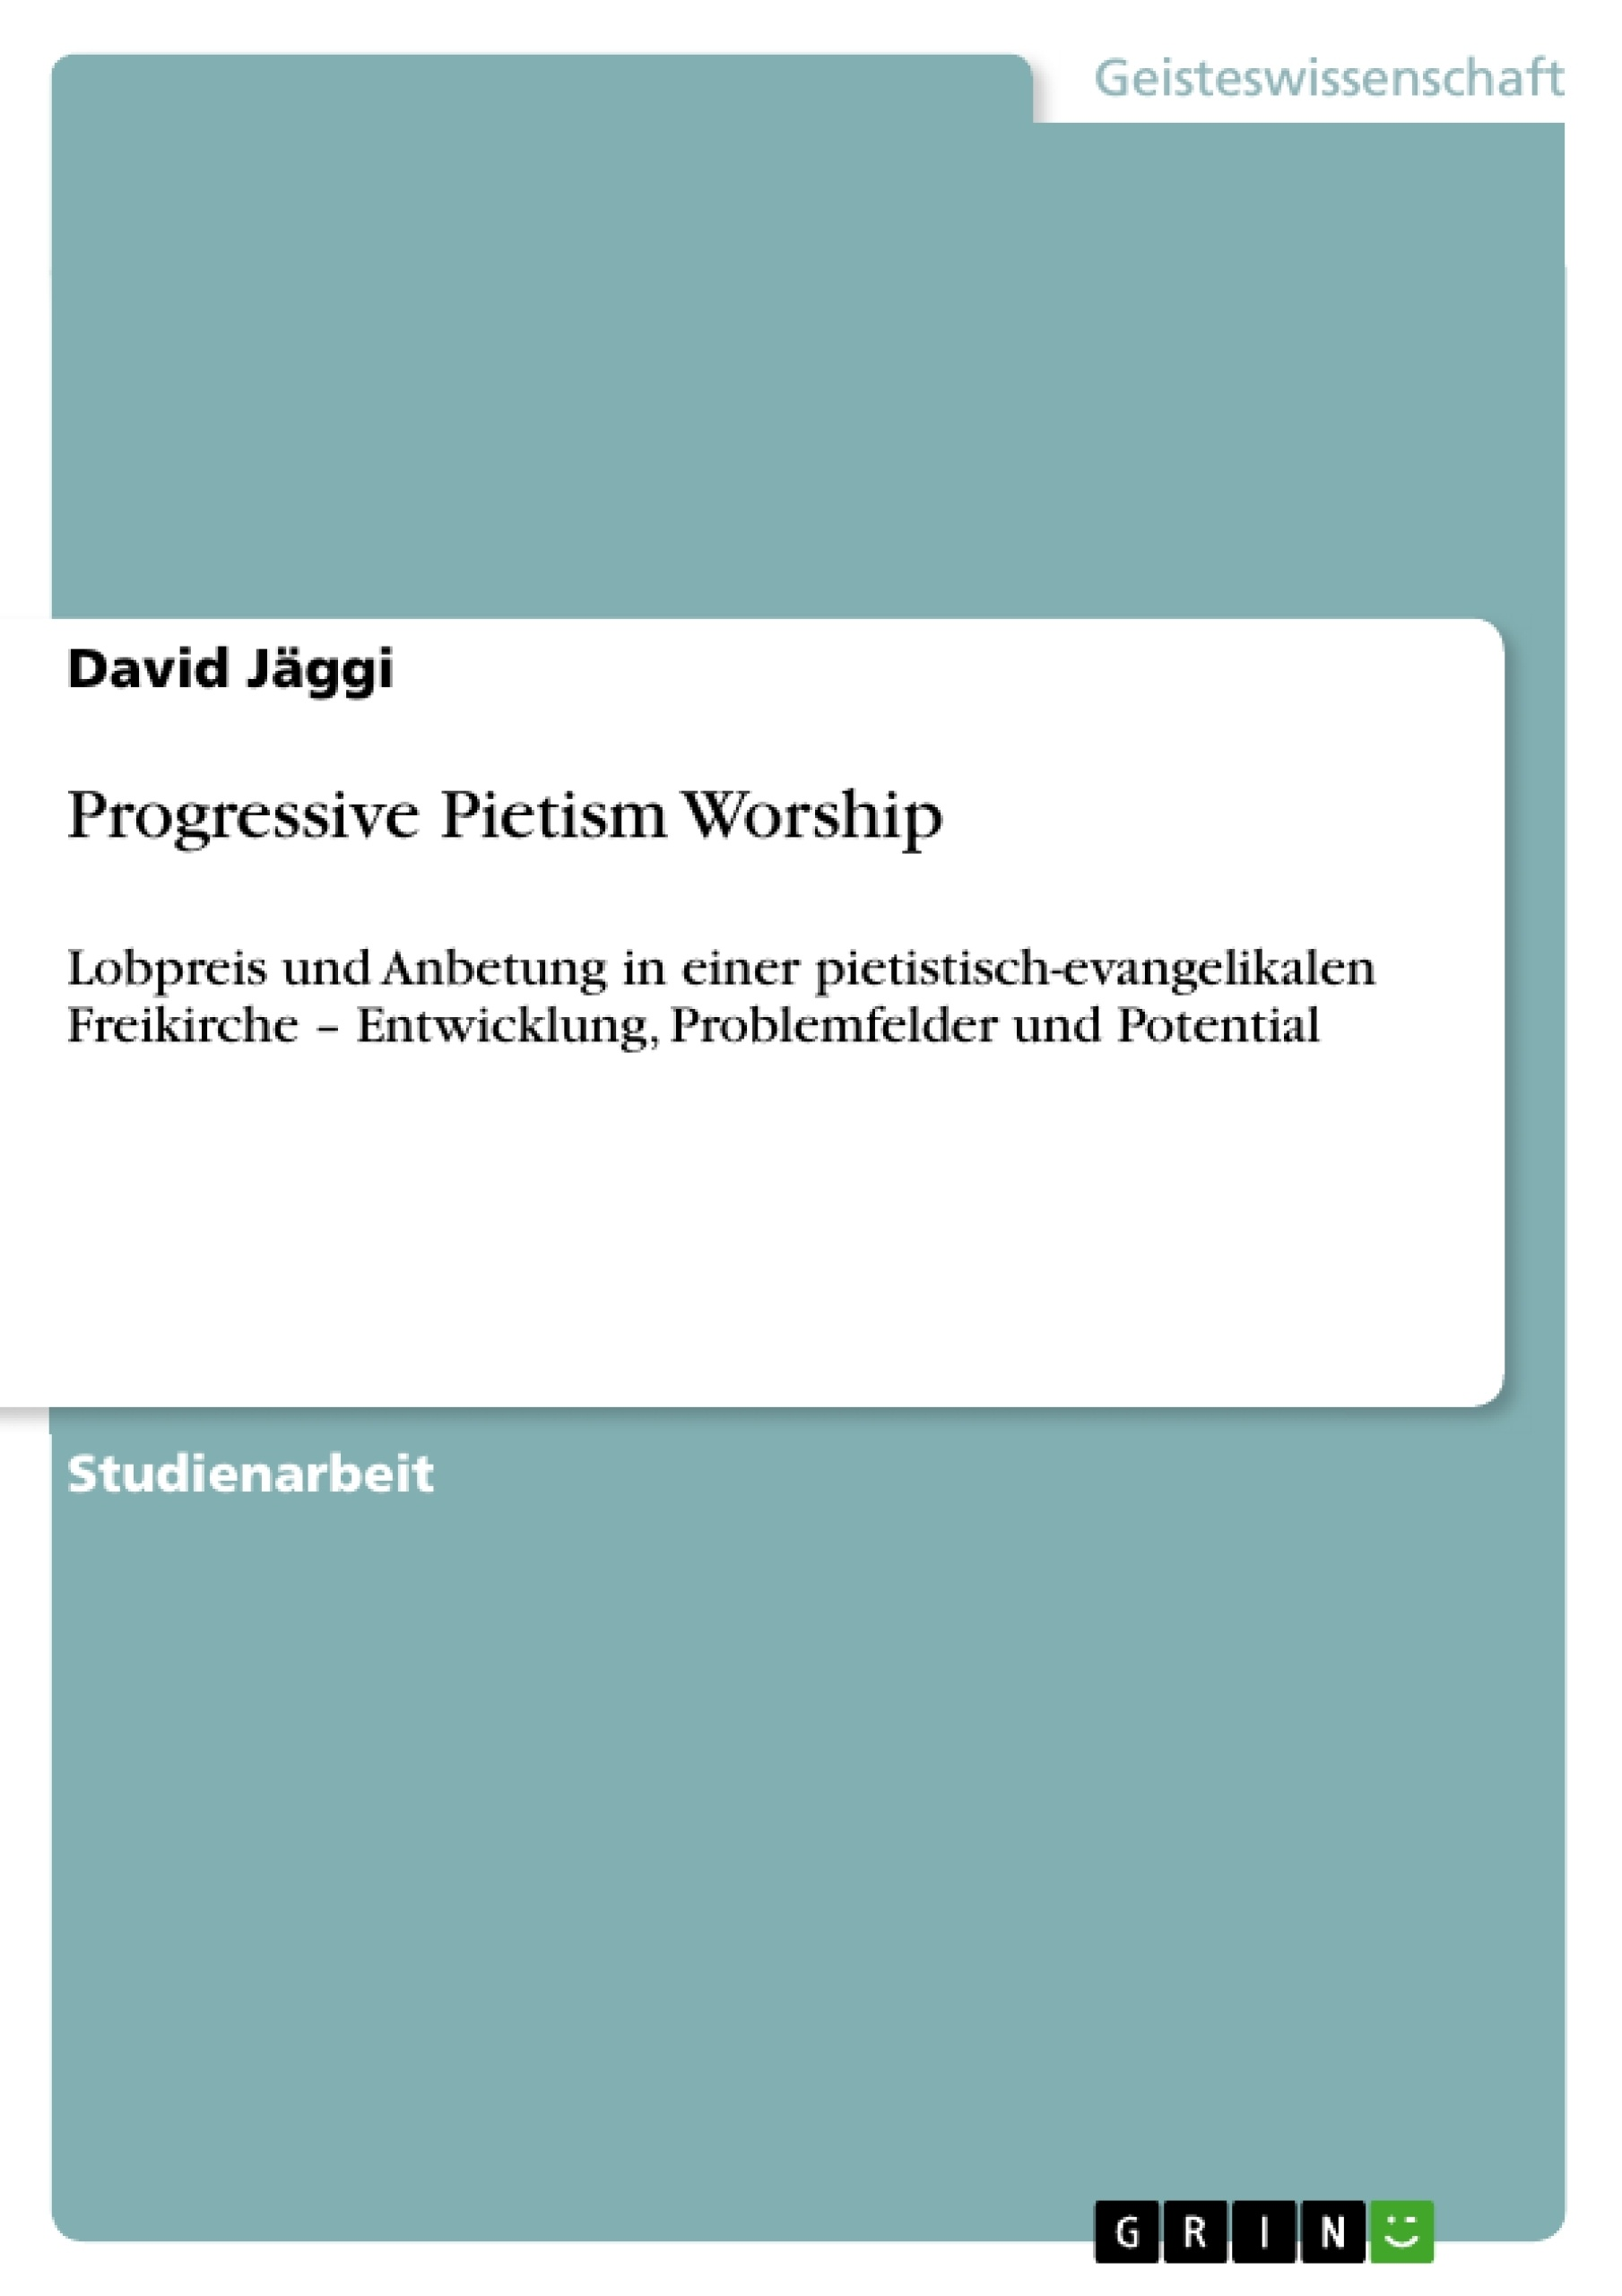 Titel: Progressive Pietism Worship